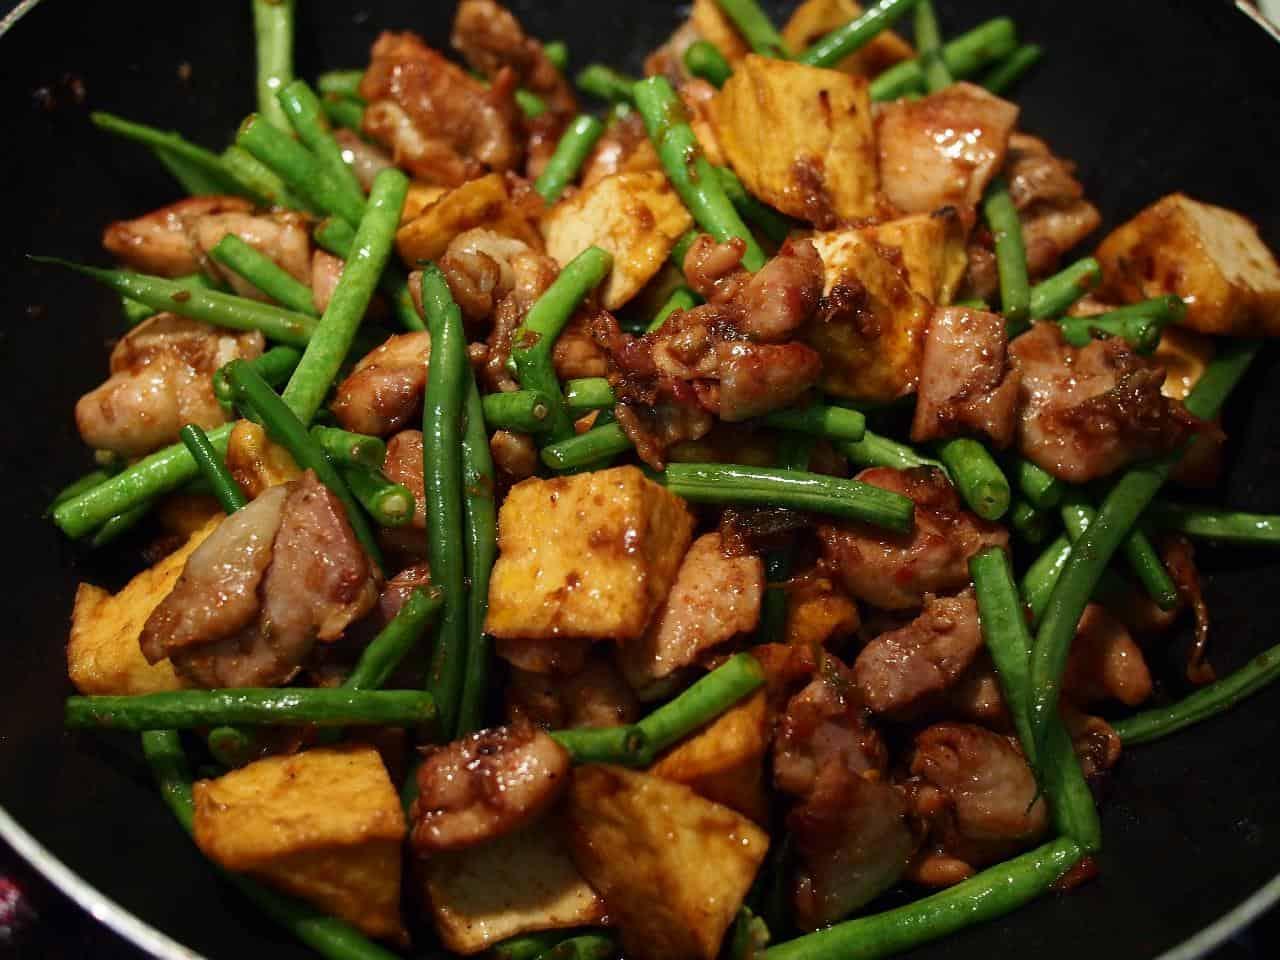 Marinated tofu